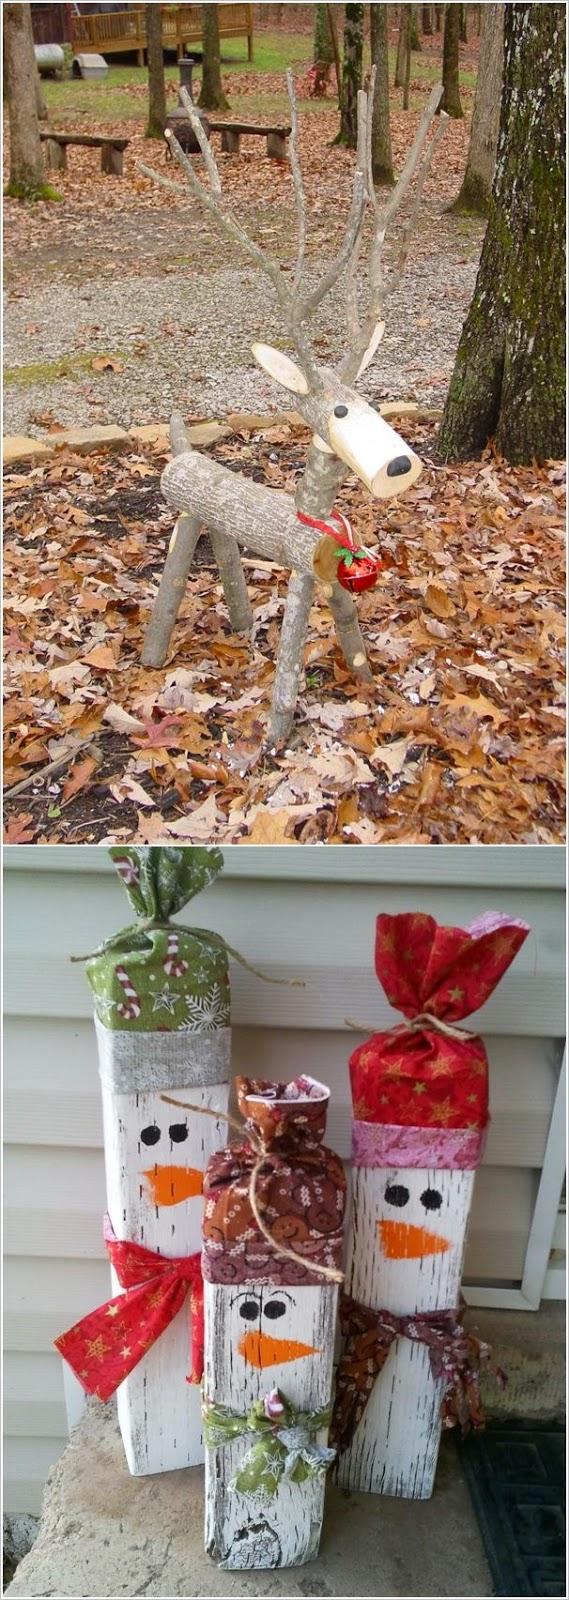 Christmas ideas 10 easy diy crafts decorating ideas for for Funny diy christmas decorations